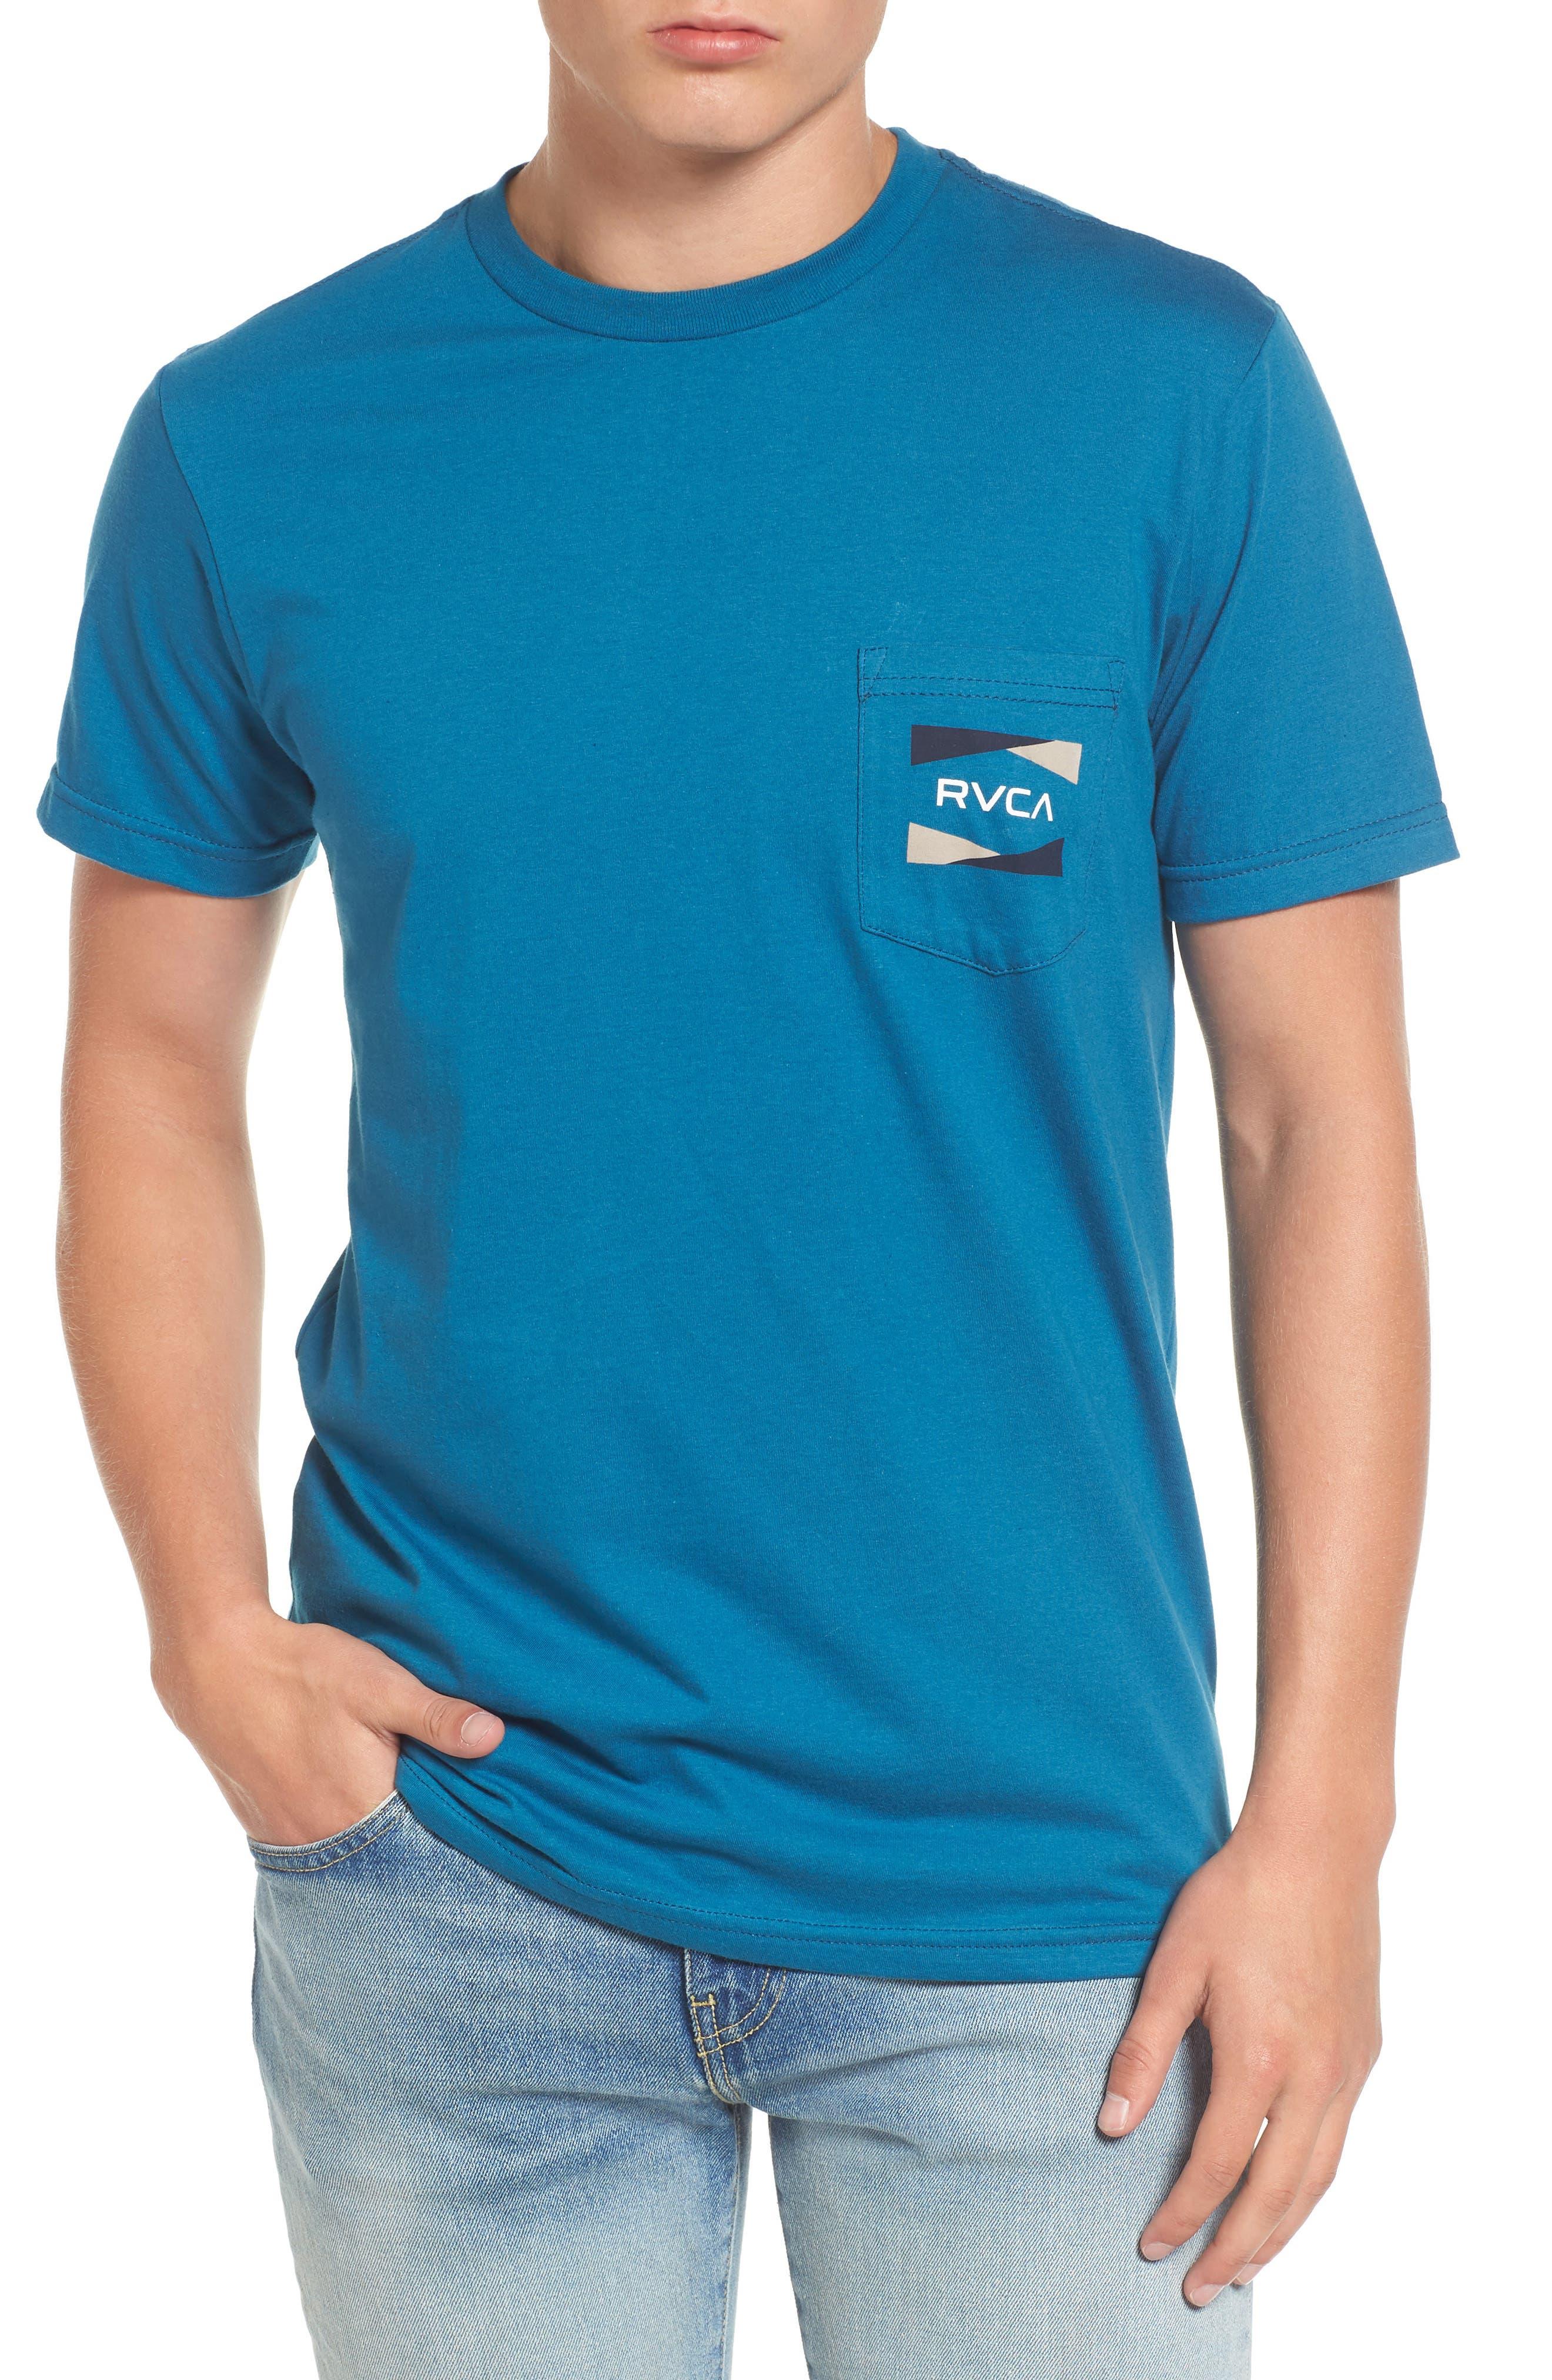 Main Image - RVCA Nation 2 Graphic Pocket T-Shirt